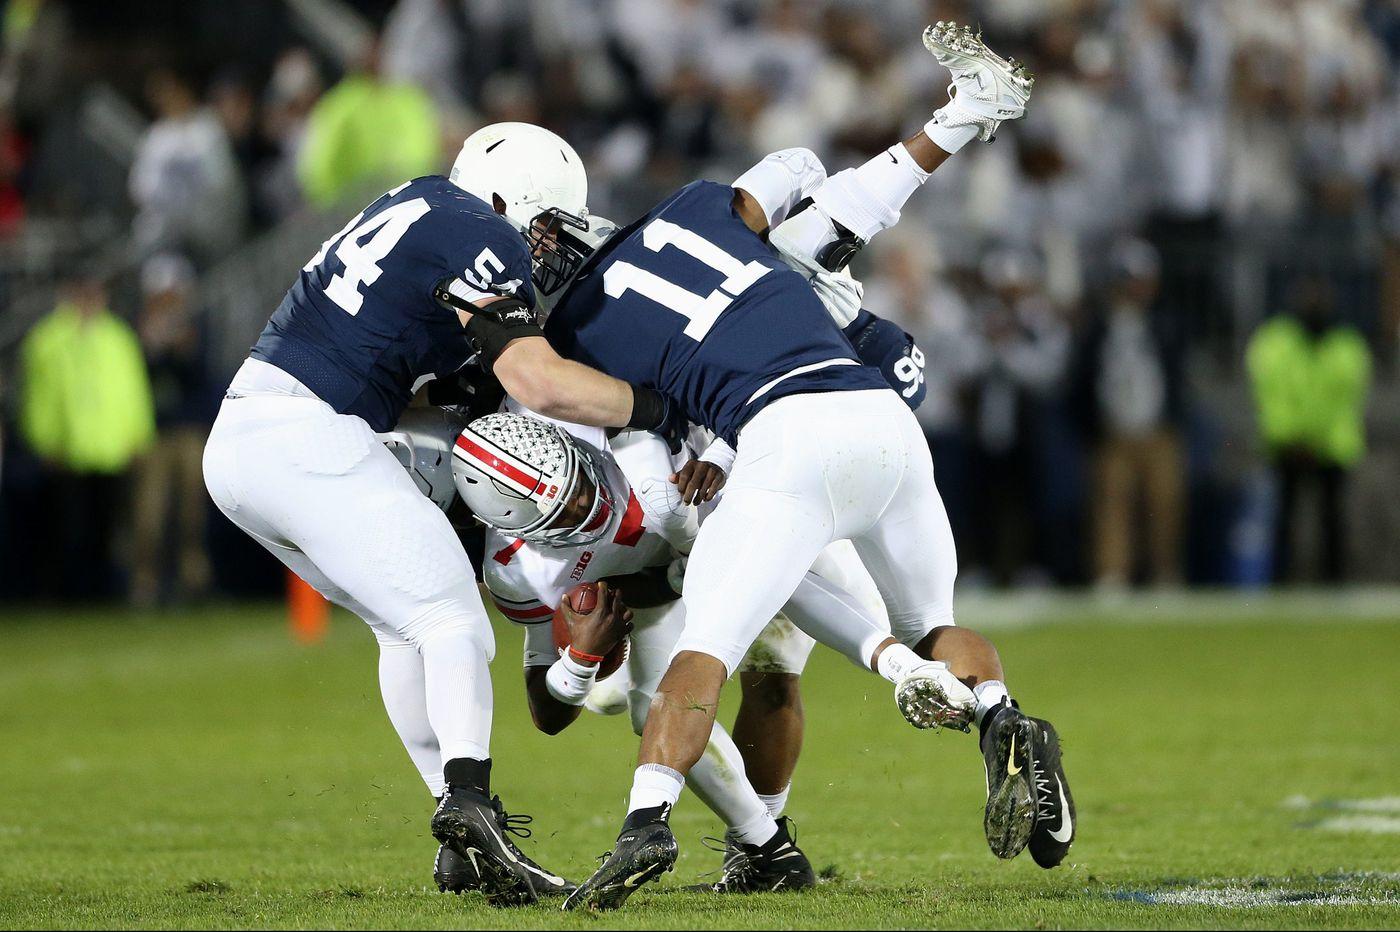 Penn State's defense focuses on tackling, depth